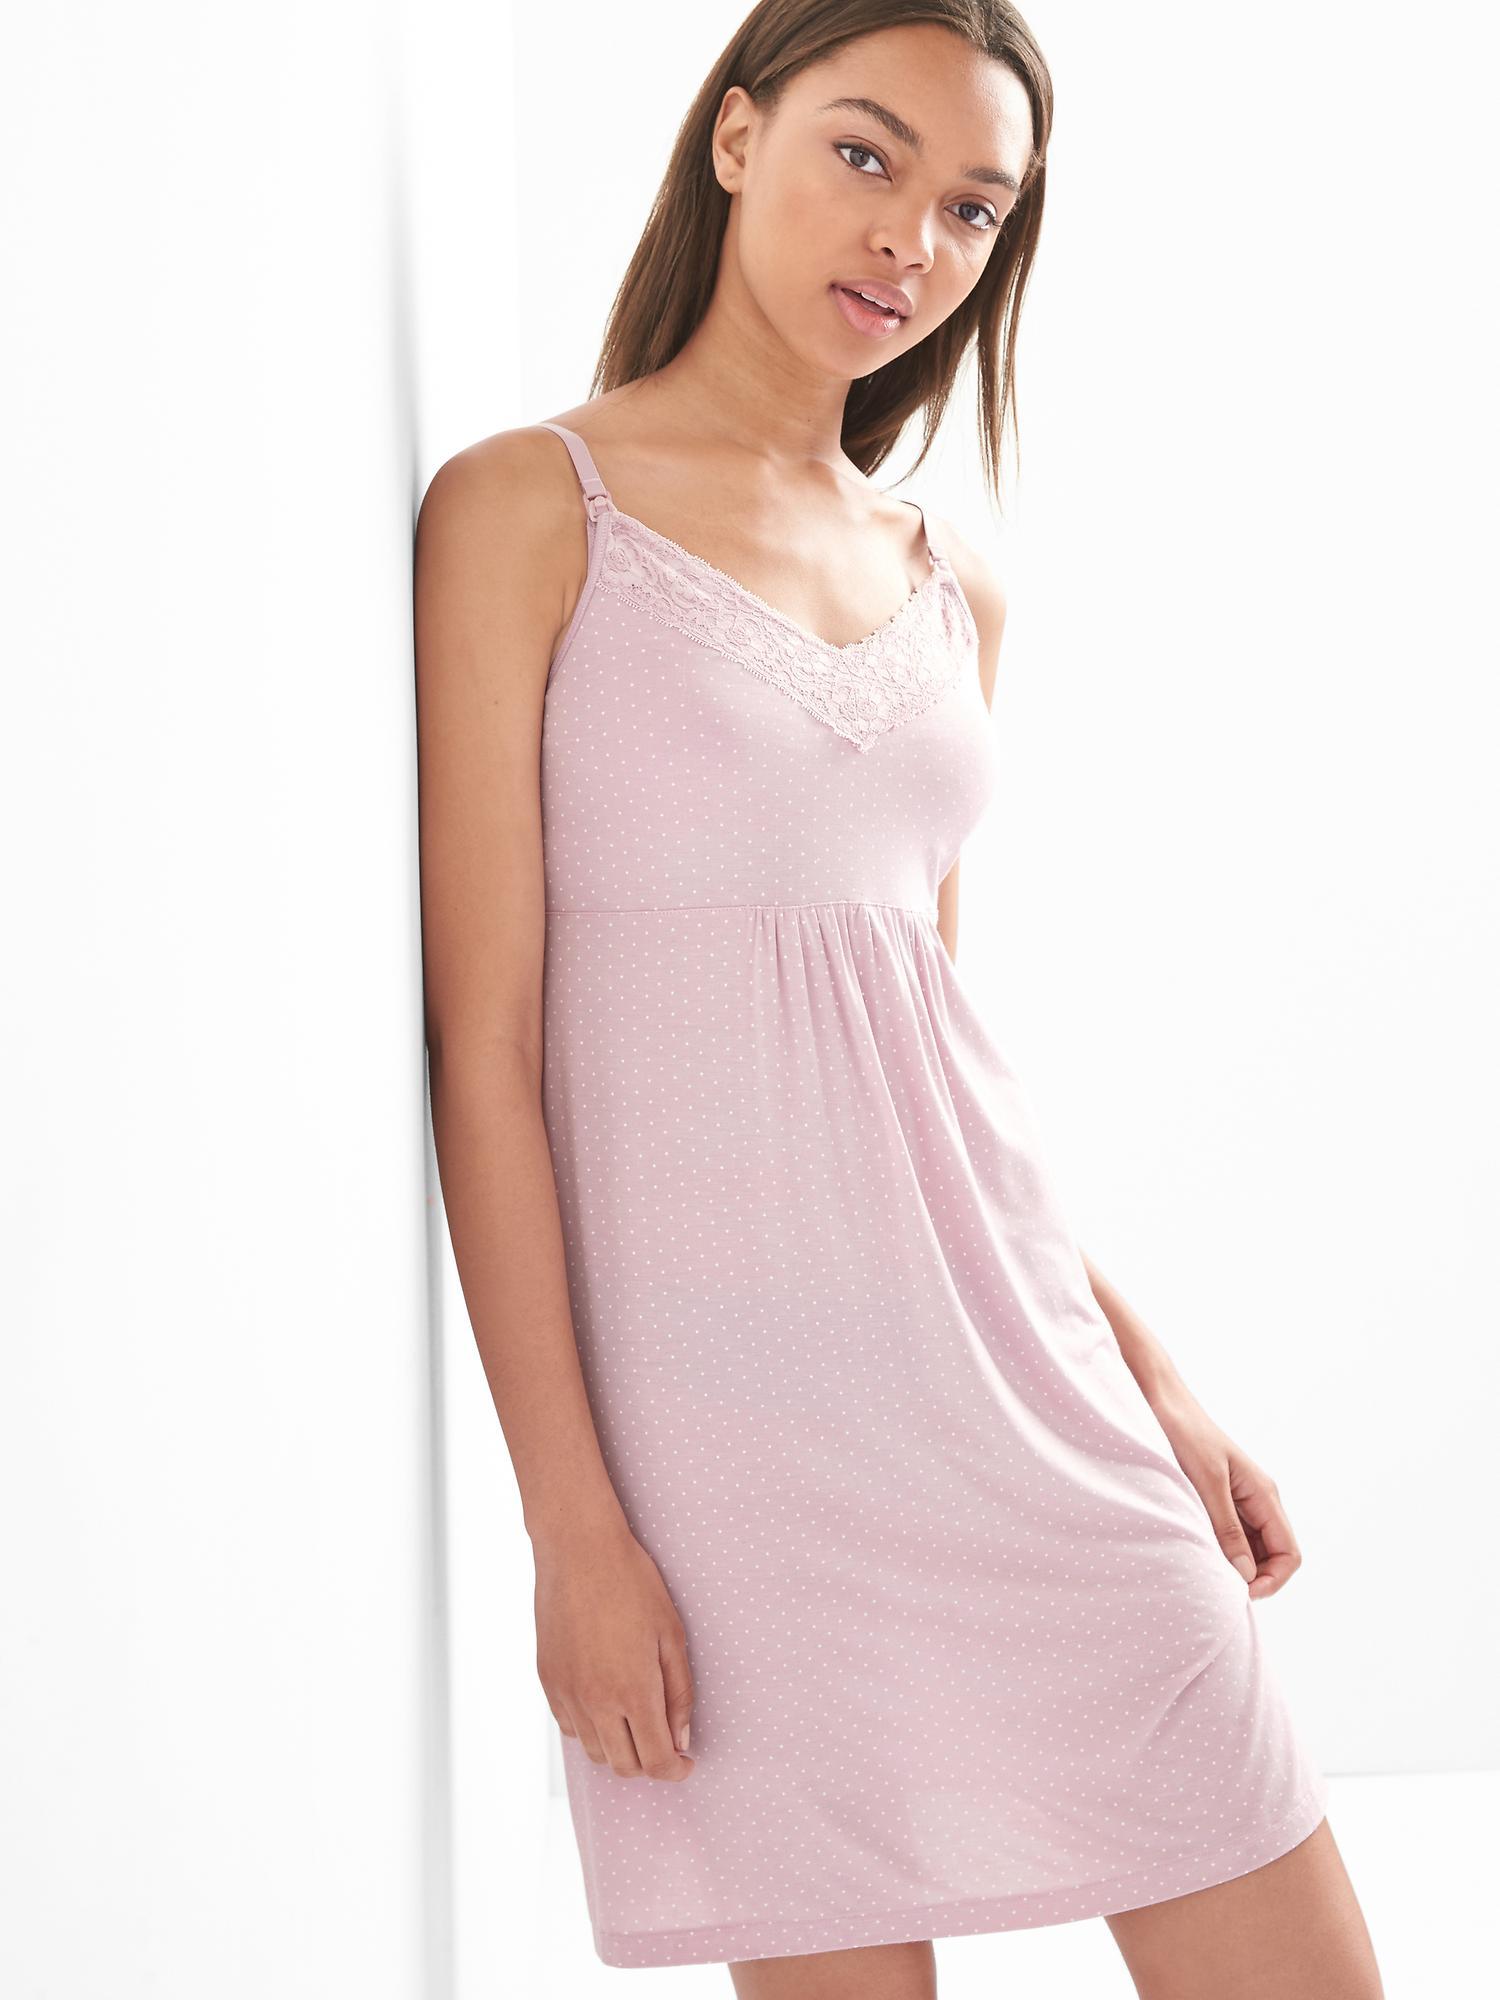 Maternity nursing nightgown | Gap